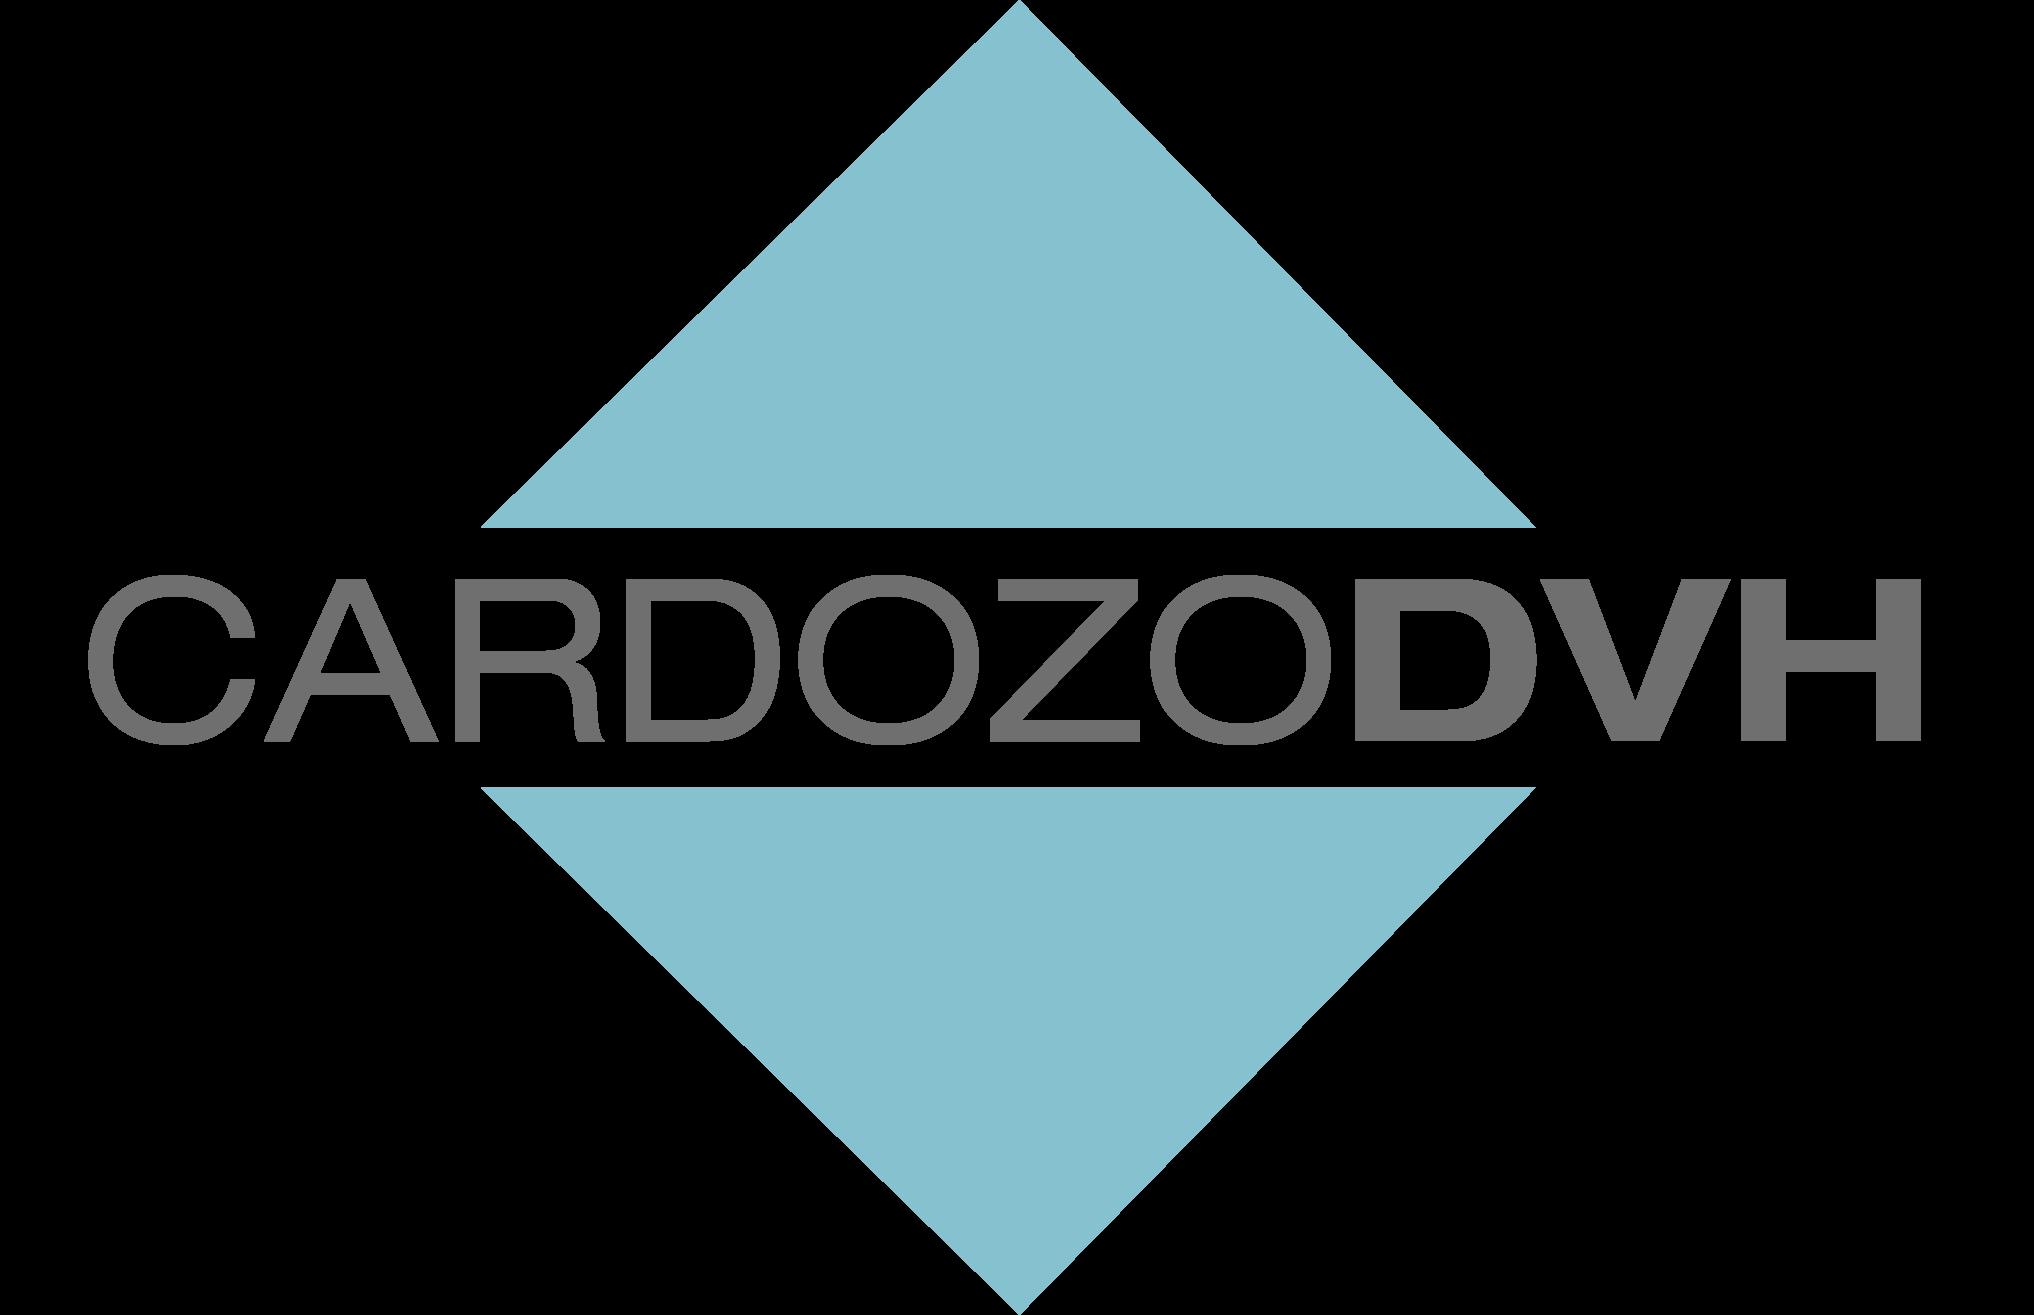 DVH Cardozo